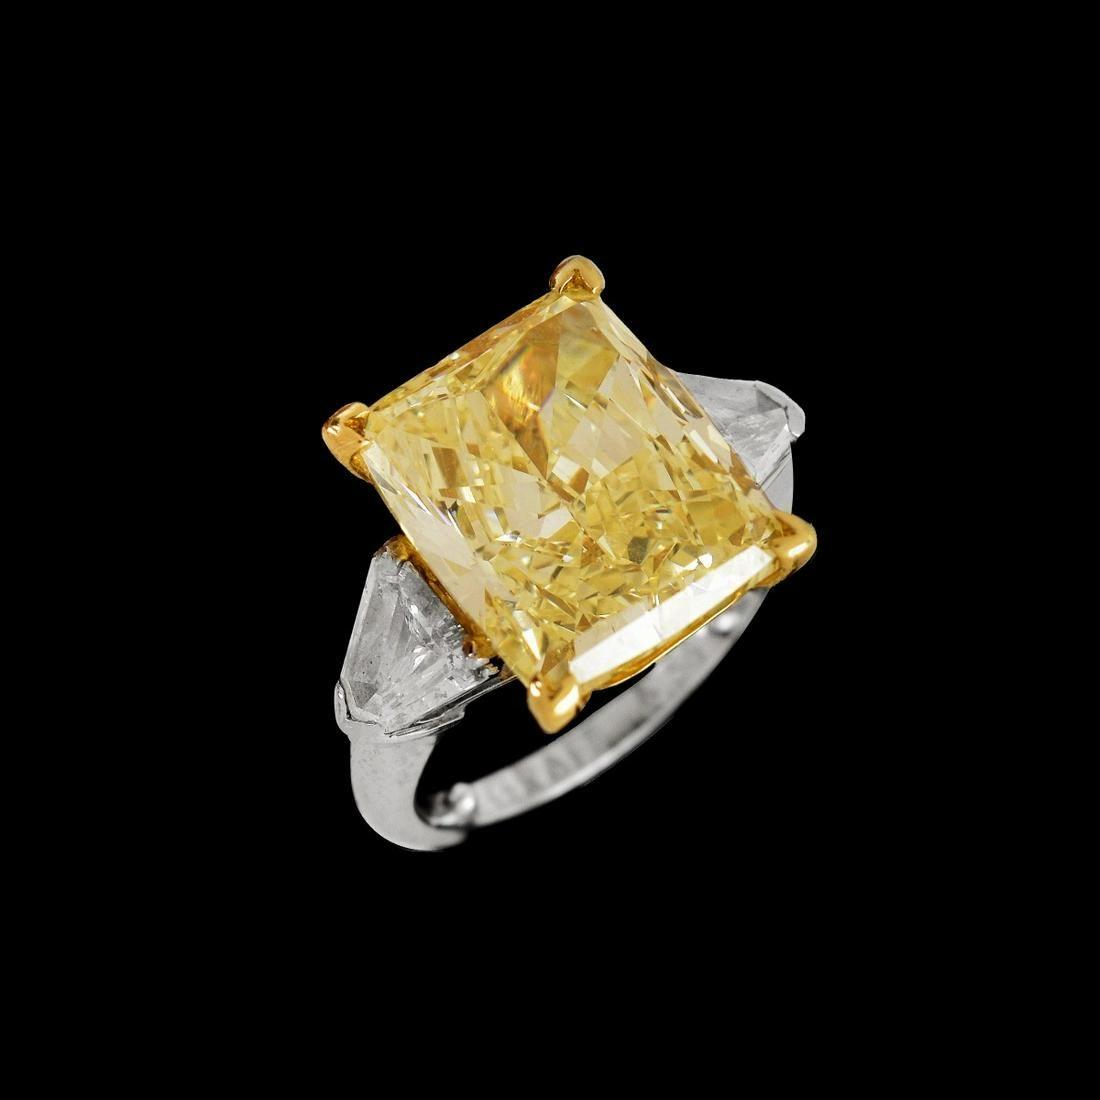 Graff 8.54ct Fancy Yellow Diamond Ring